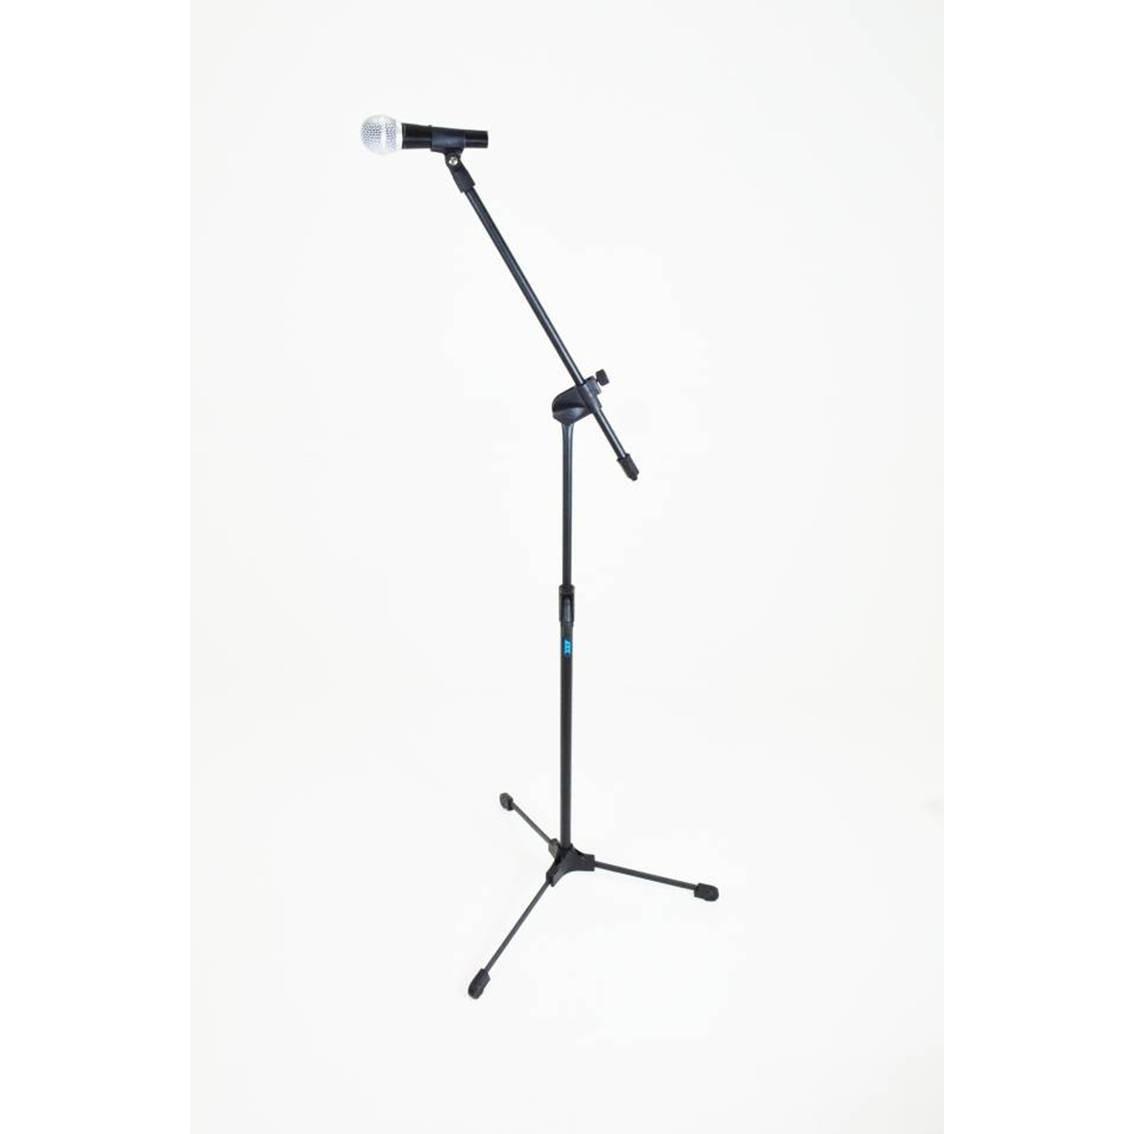 Imagem do produto Pedestal para Microfone ASK TPS